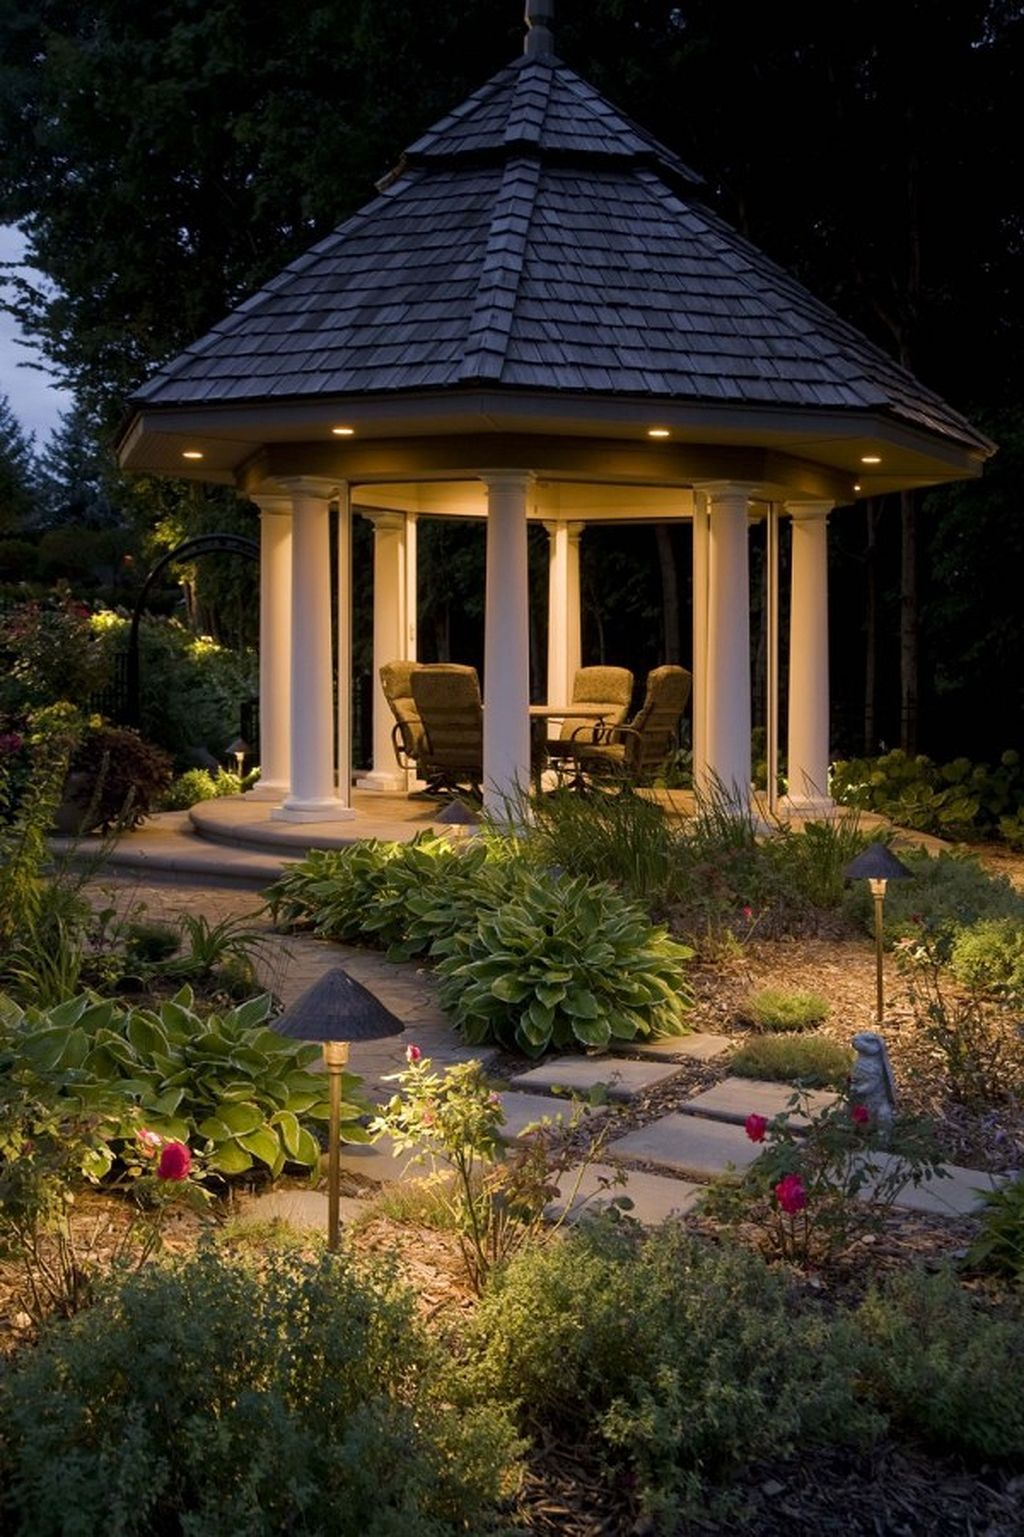 Awesome Night Garden Light Ideas Https Gardenmagz Com Night